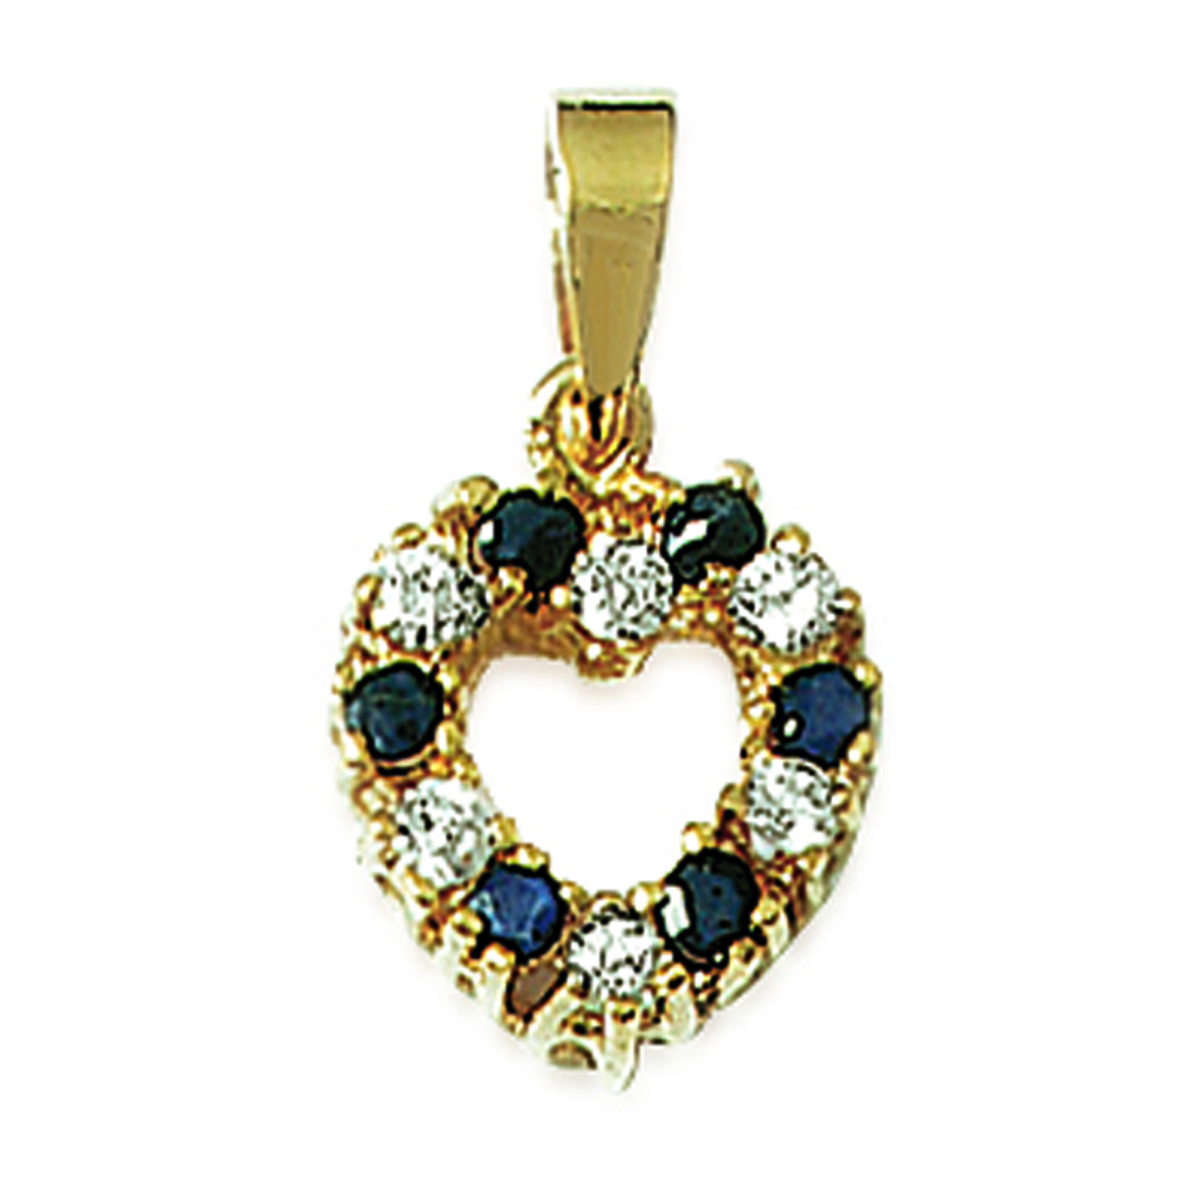 Pendentif Plaqué Or \'Love\' saphir blanc doré - 18x12 mm - [J5214]